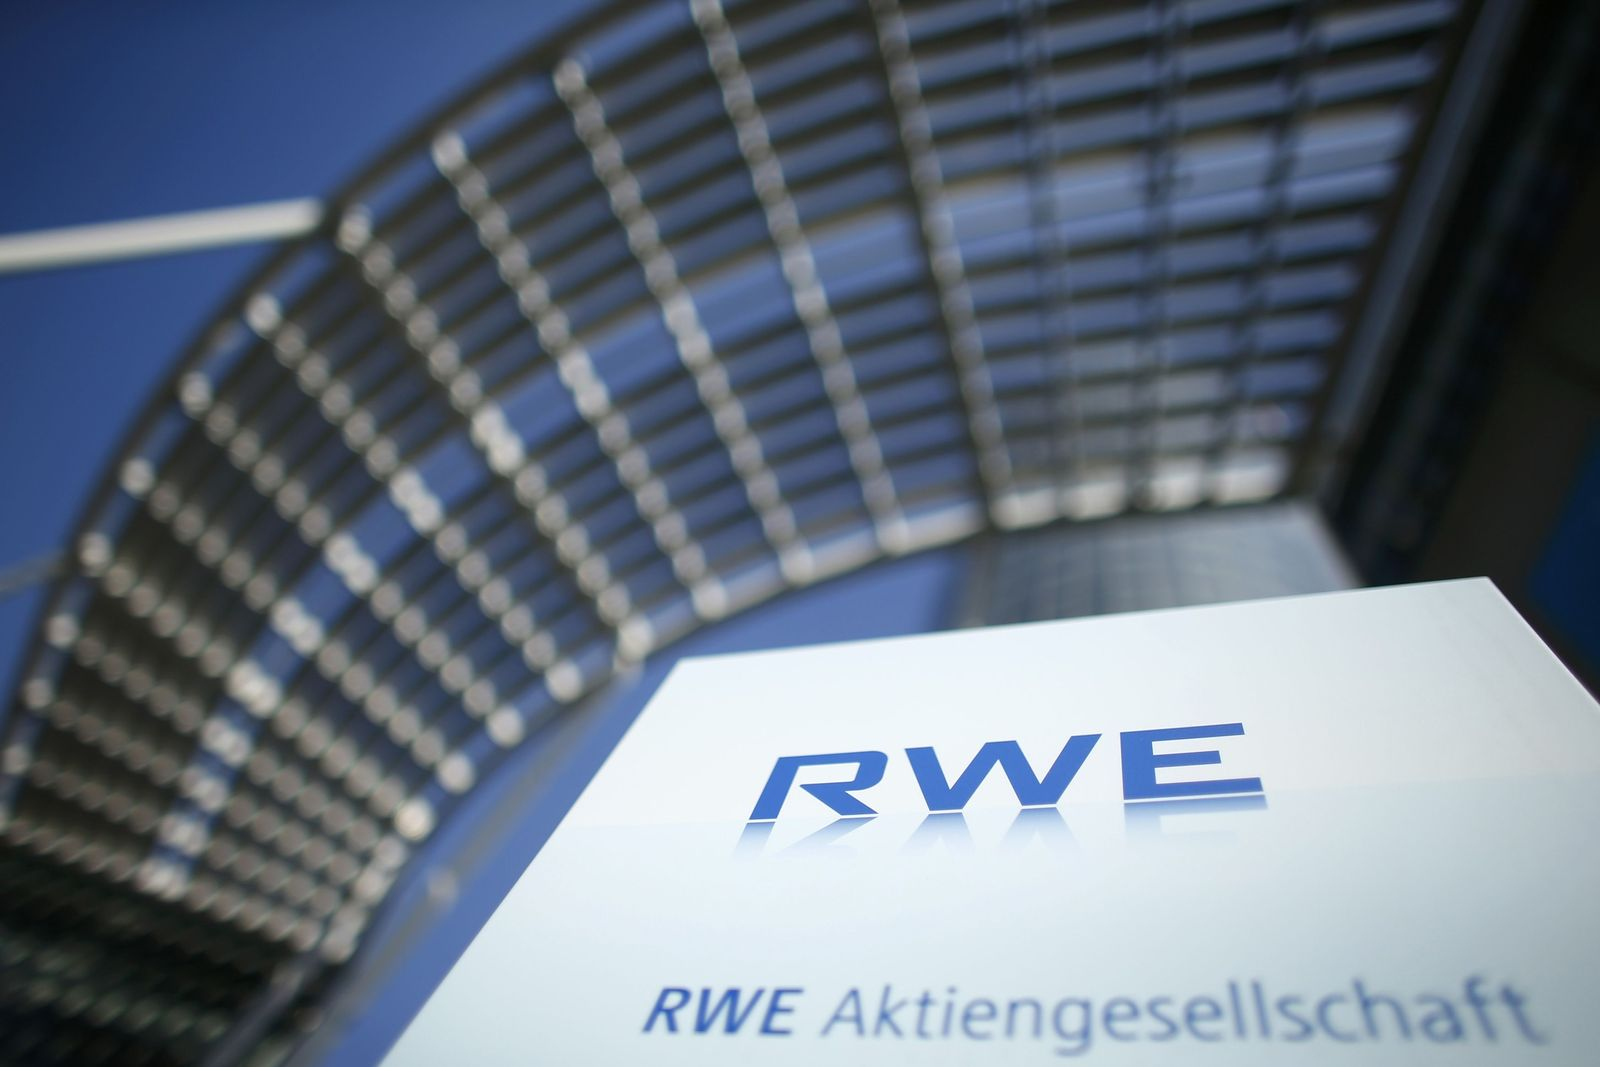 Symbolbild SEO / RWE / Top 10 der Kapitalvernichter